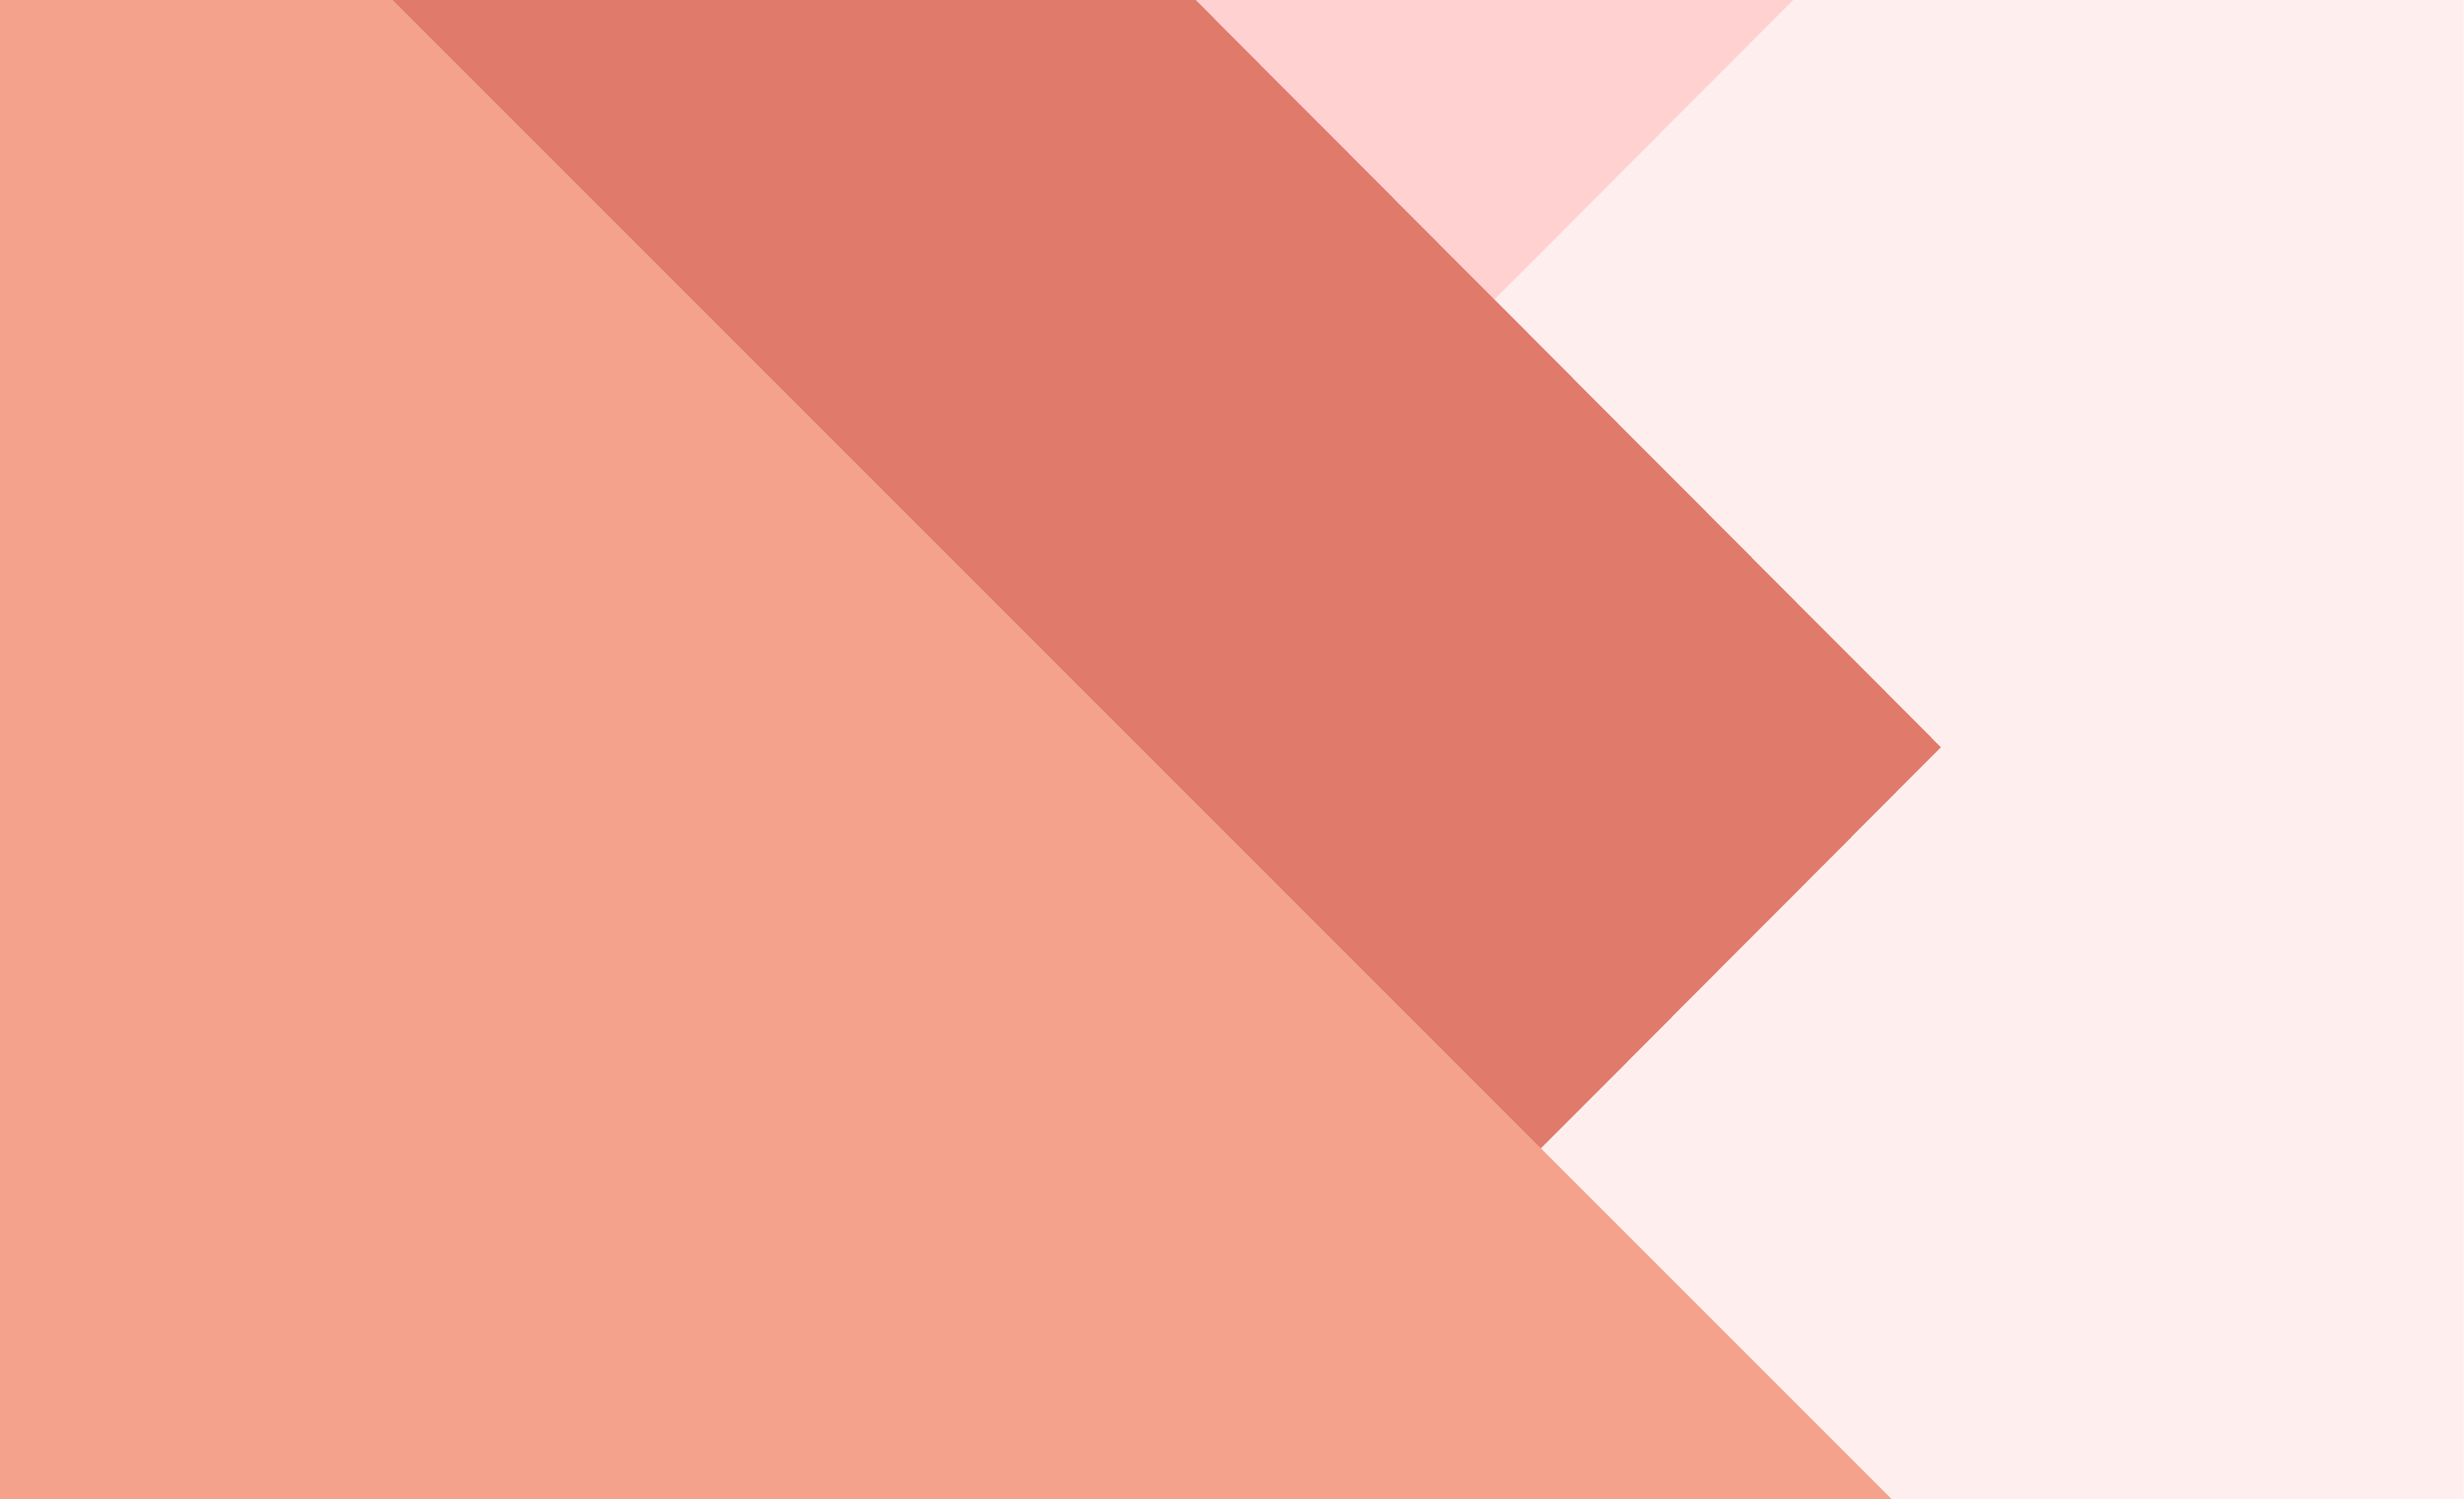 Group of squares displayed diagonally